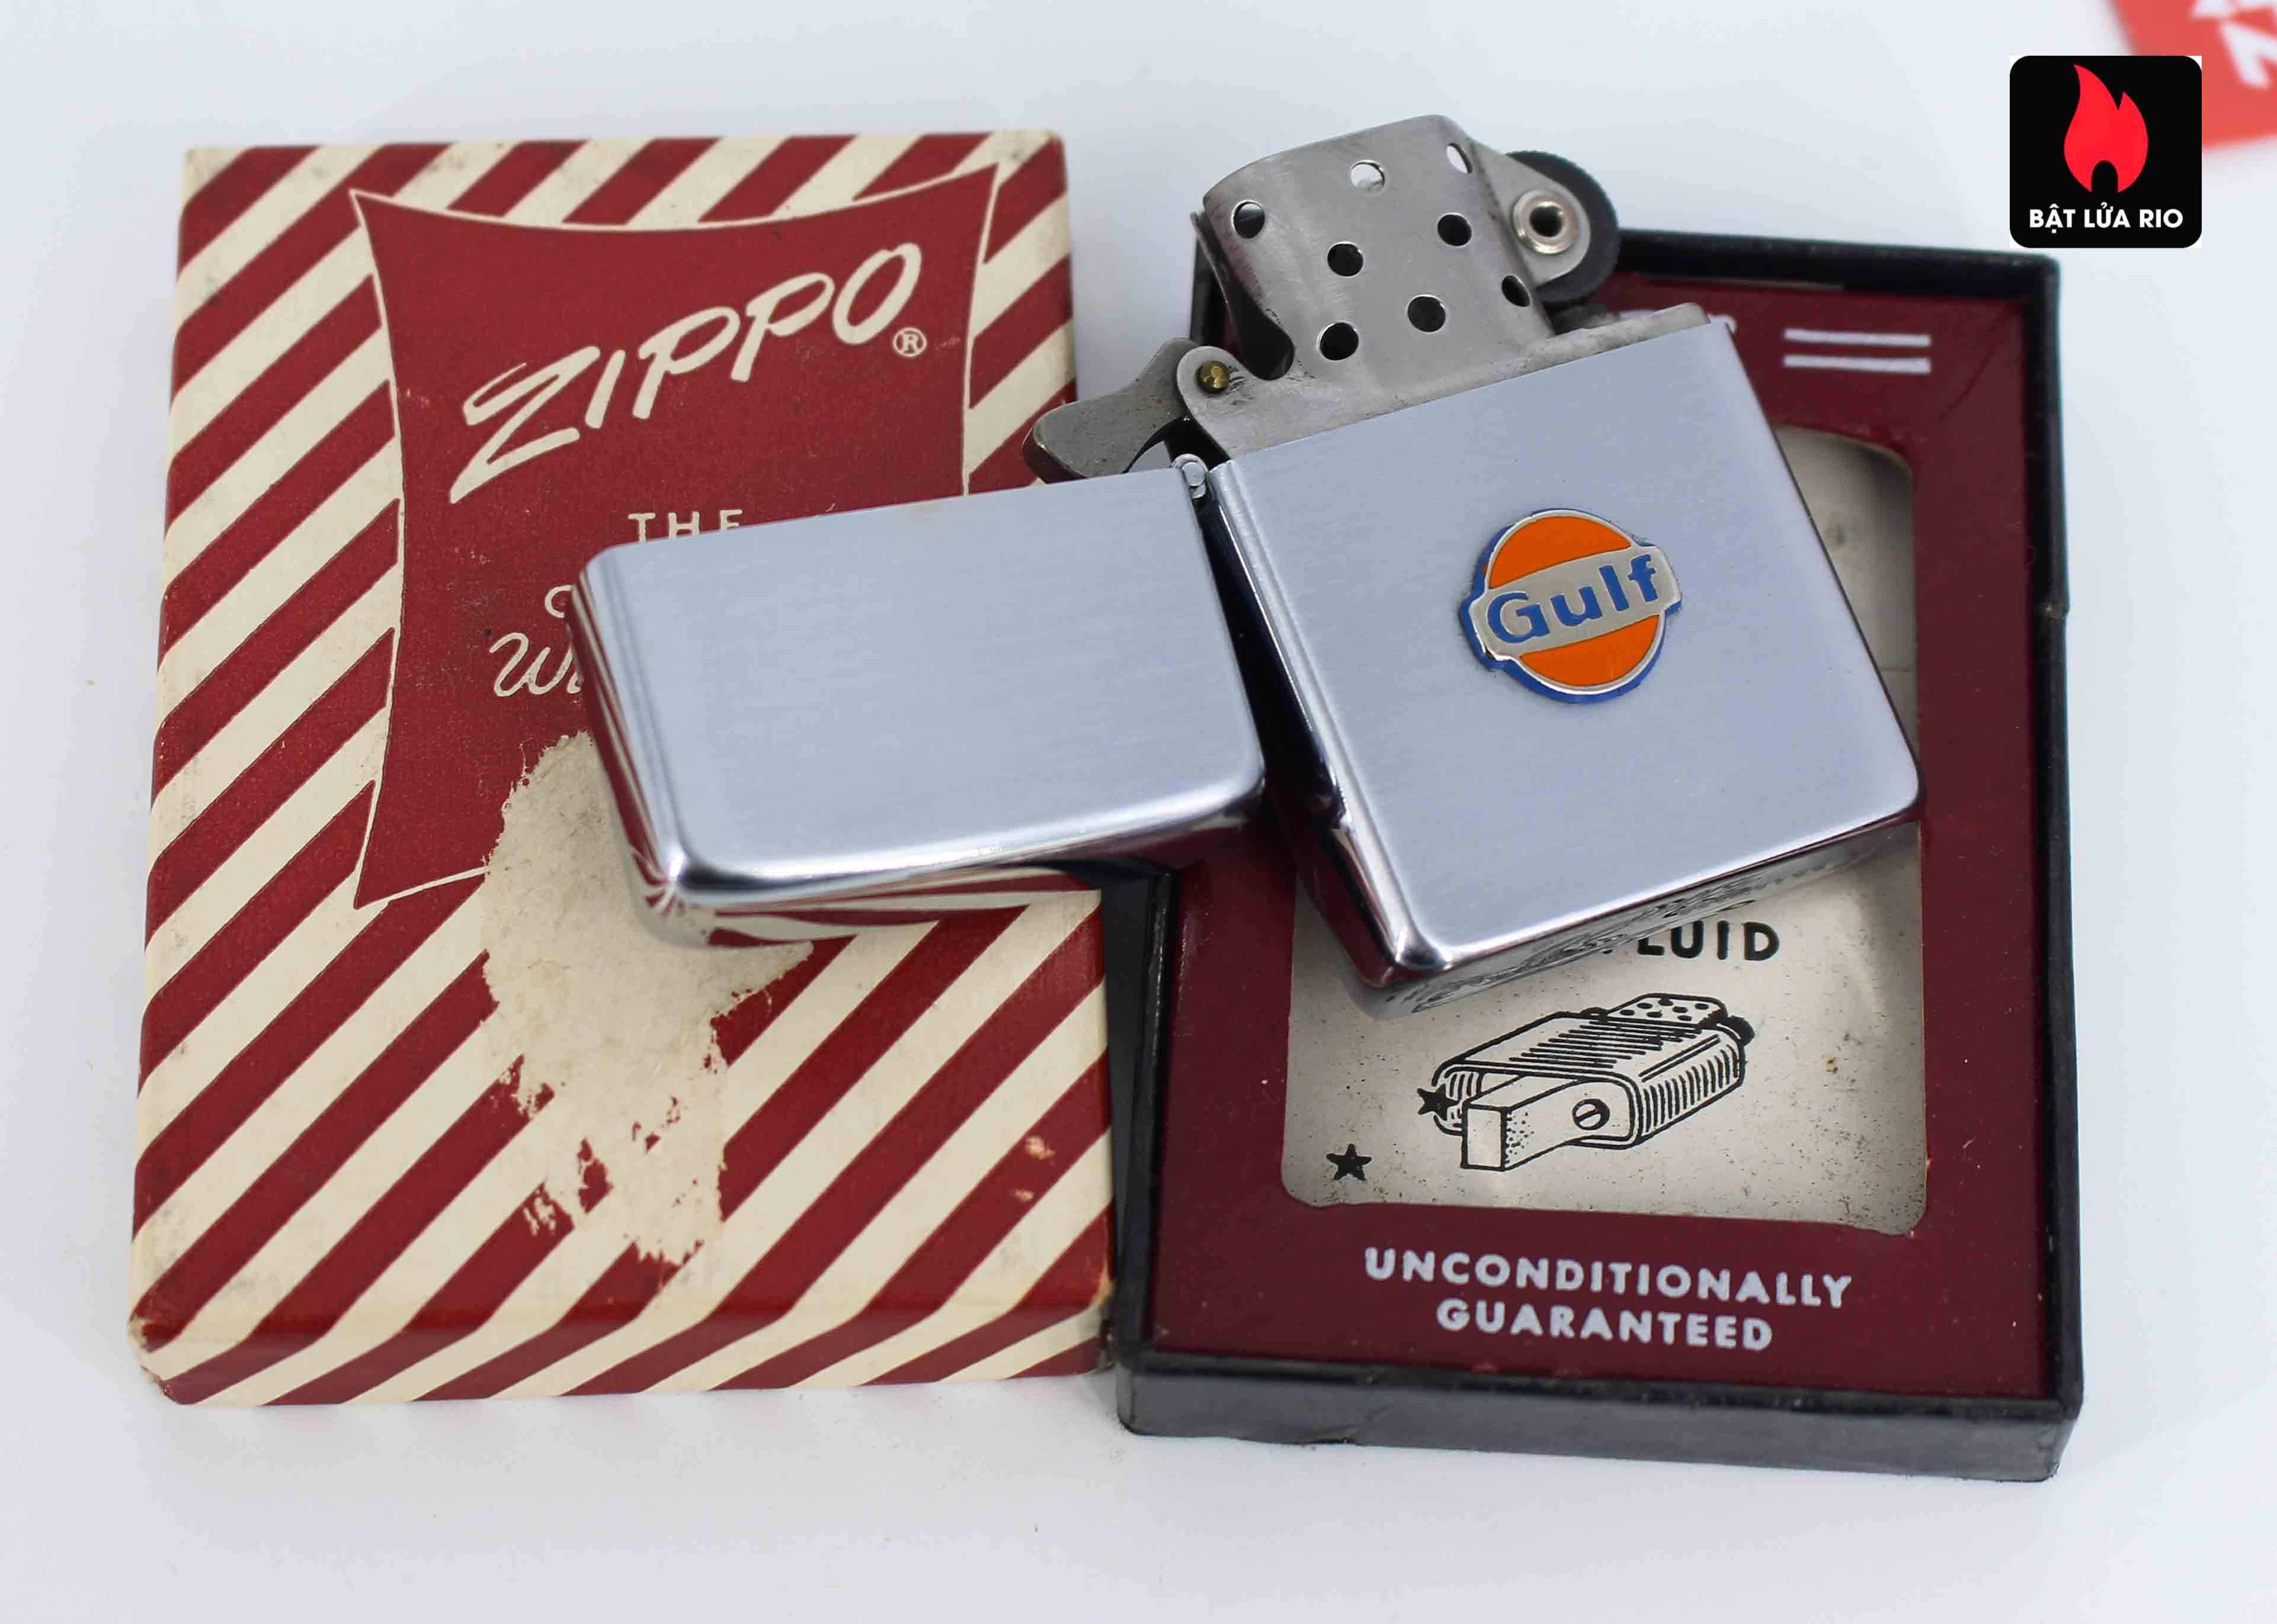 Zippo Xưa 1955-1956 - Gulf Oil 3